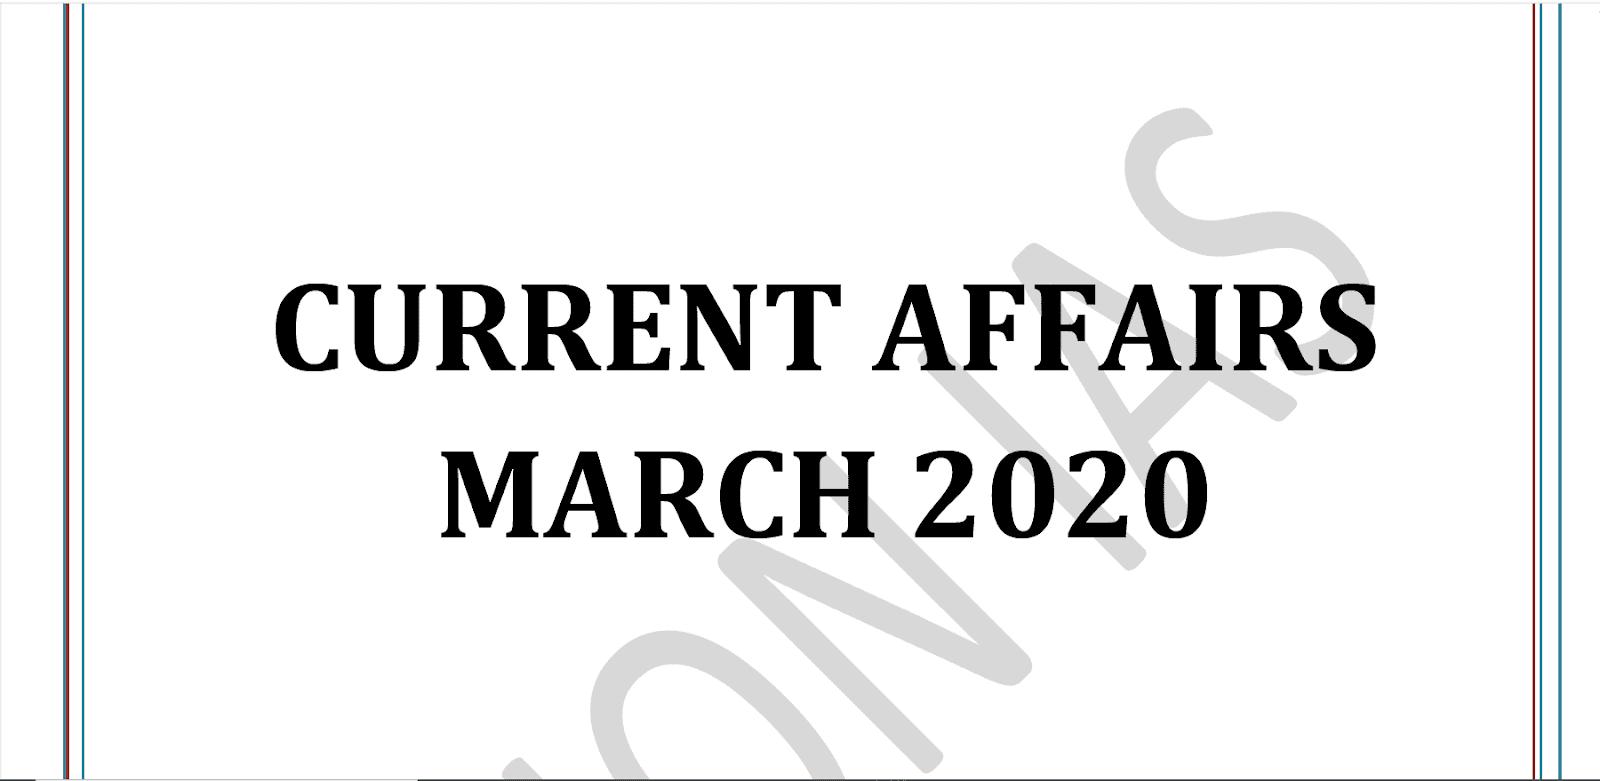 Vision IAS Current Affairs March 2020 pdf